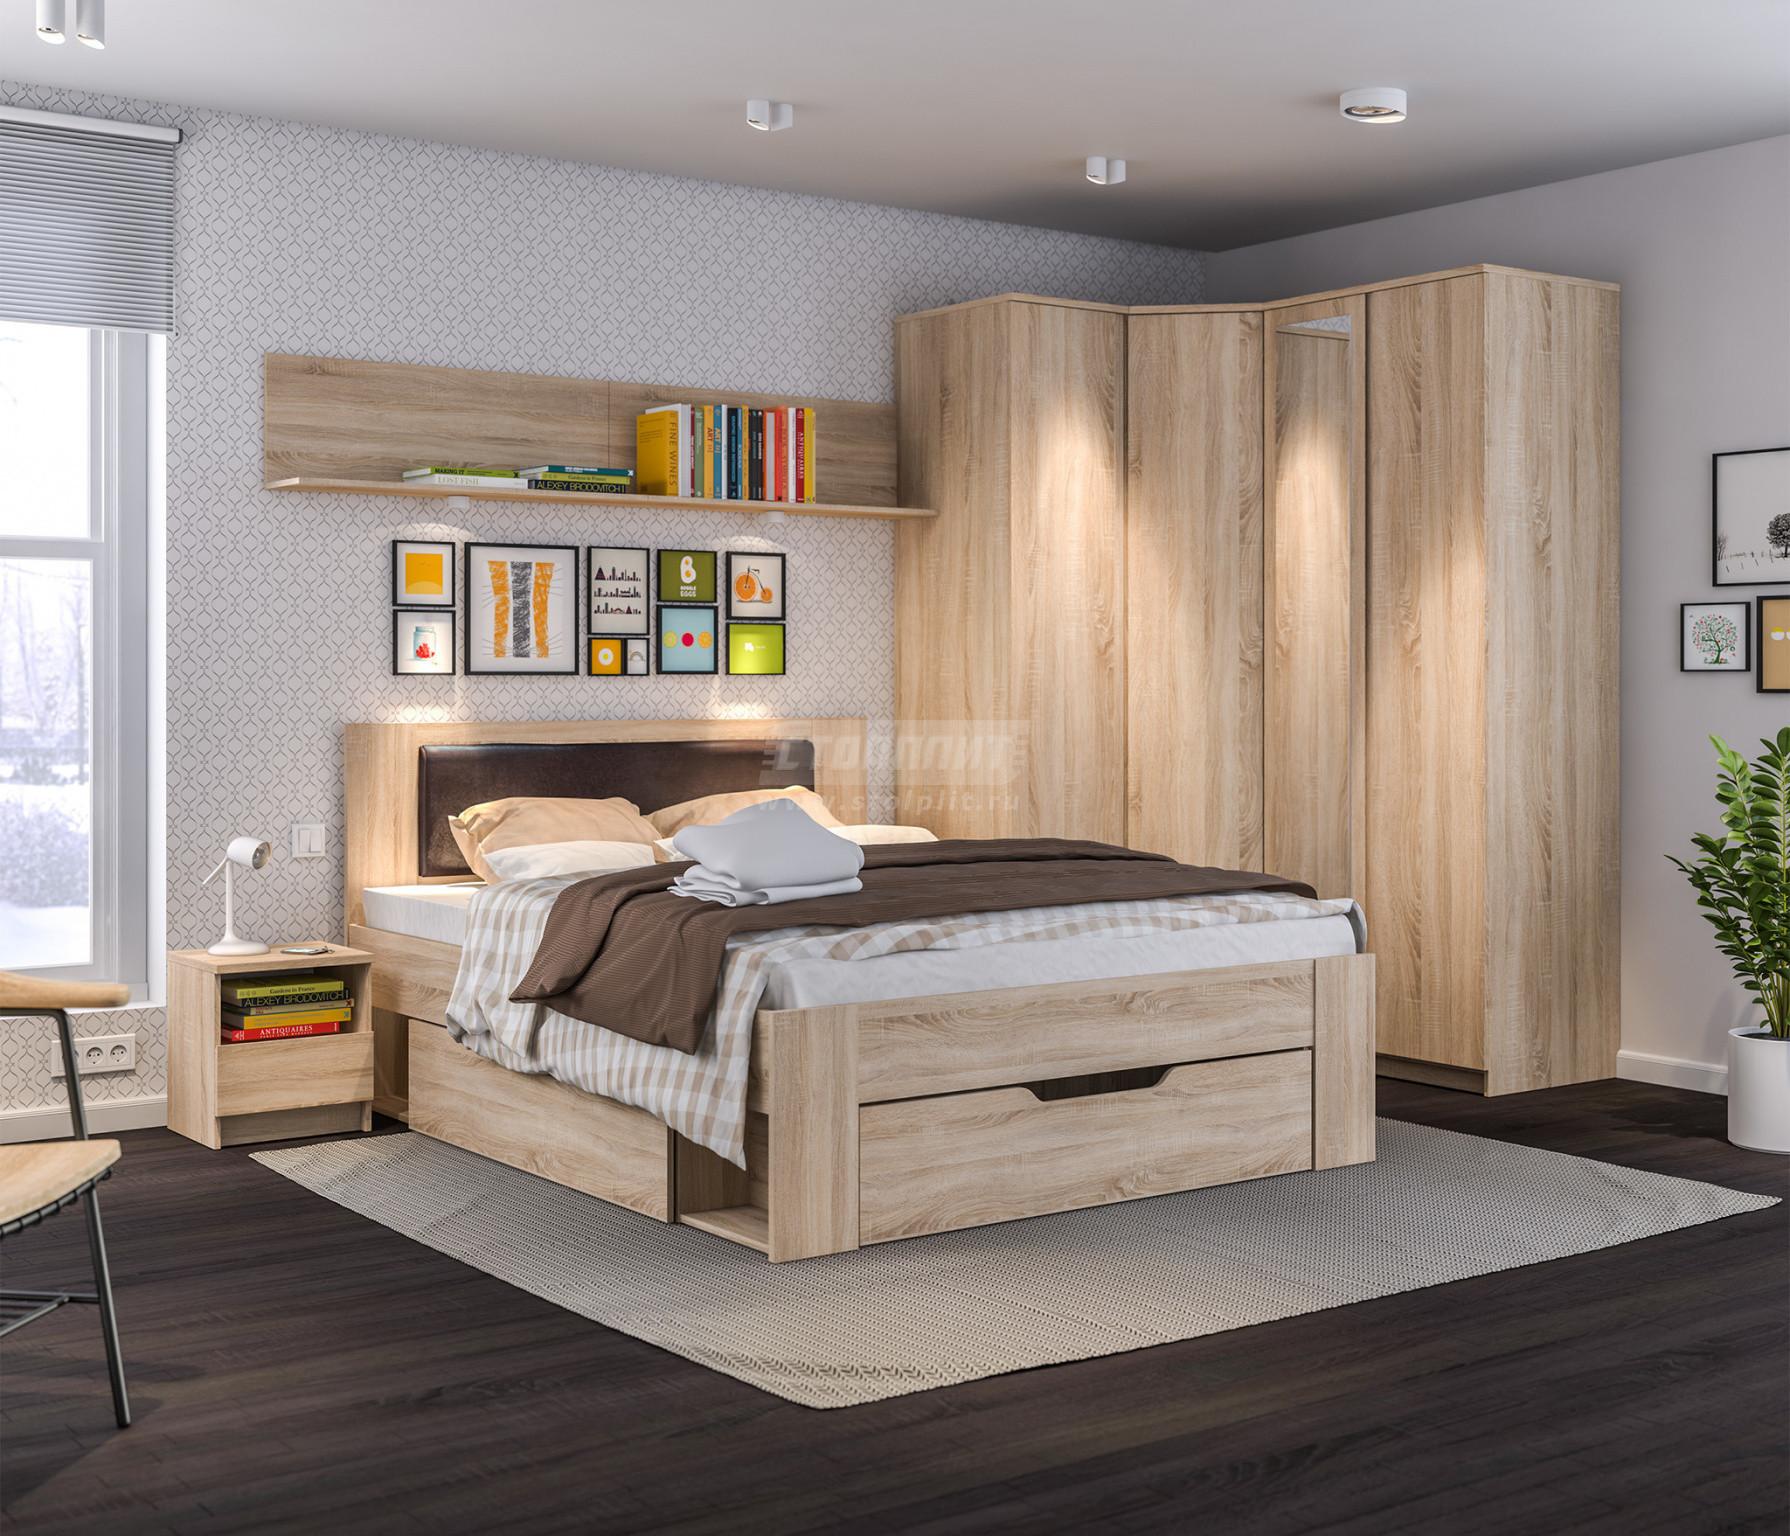 Спальня Столплит Веста 123-240-000-0183 дуб сонома